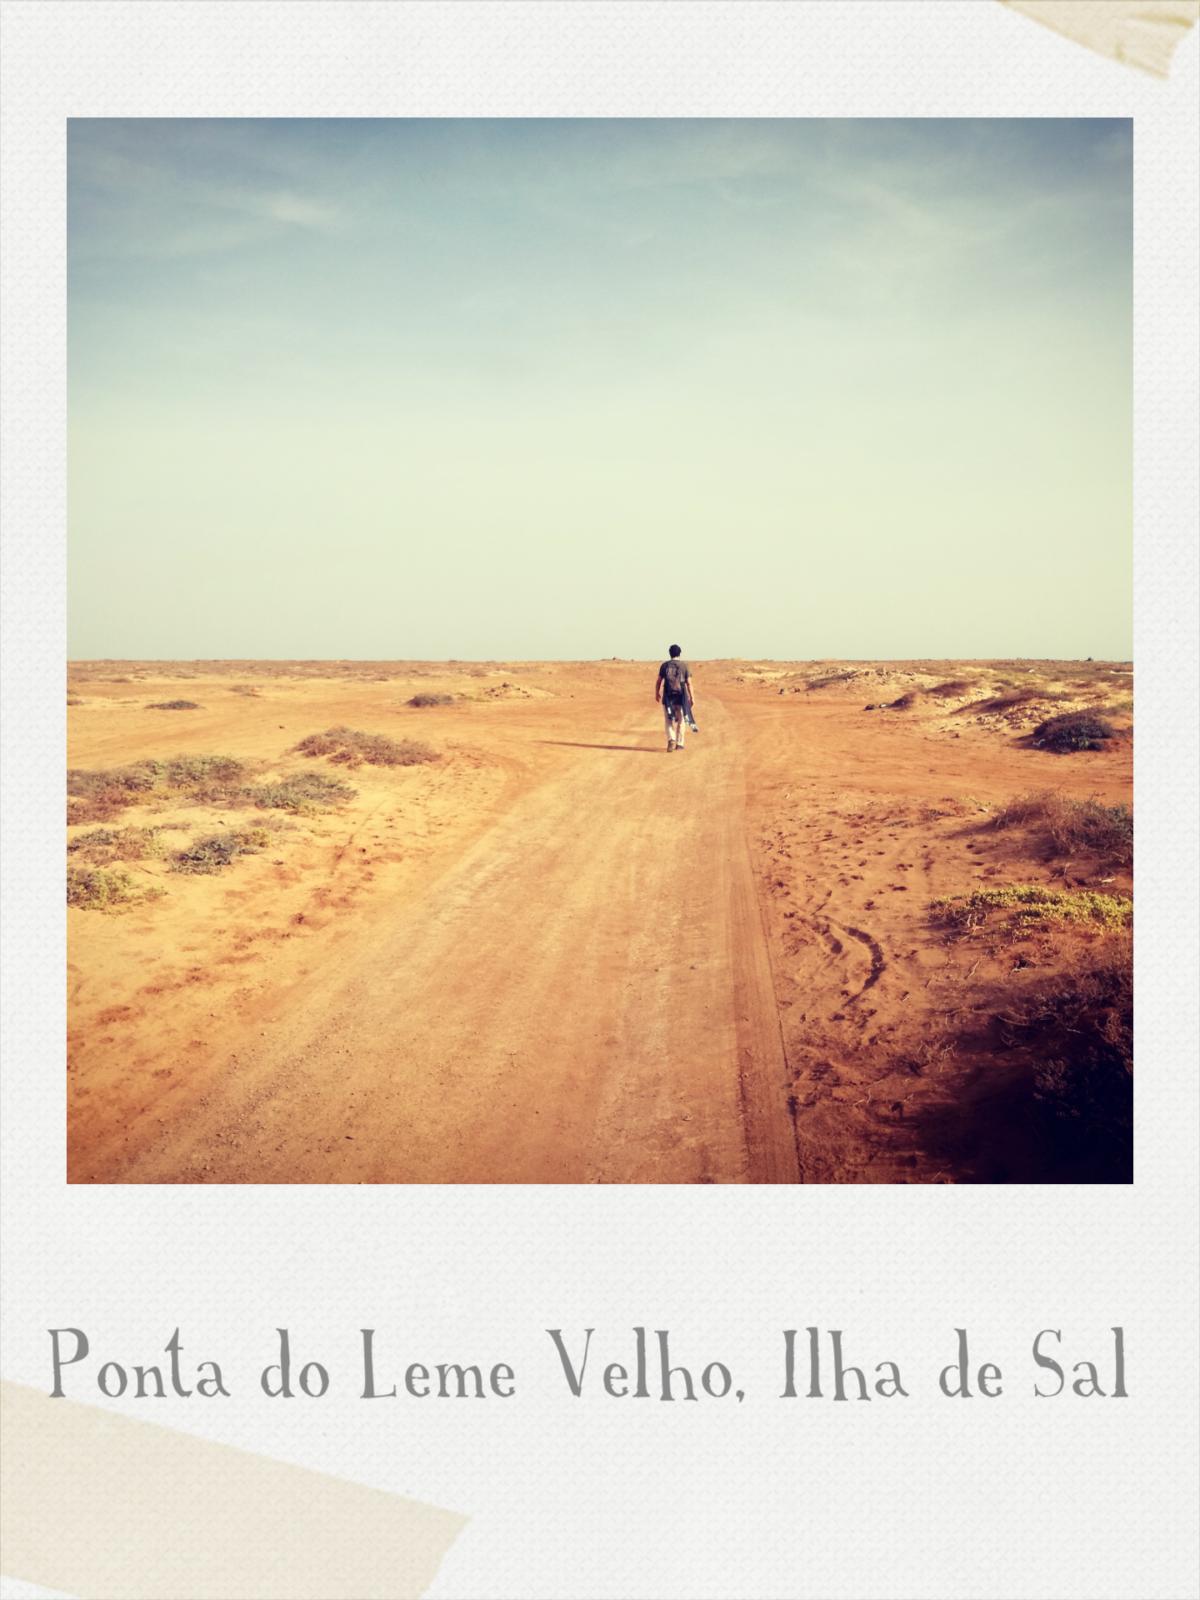 Ponta de Leme Velho _ Ilha de Sal, 9 febbraio